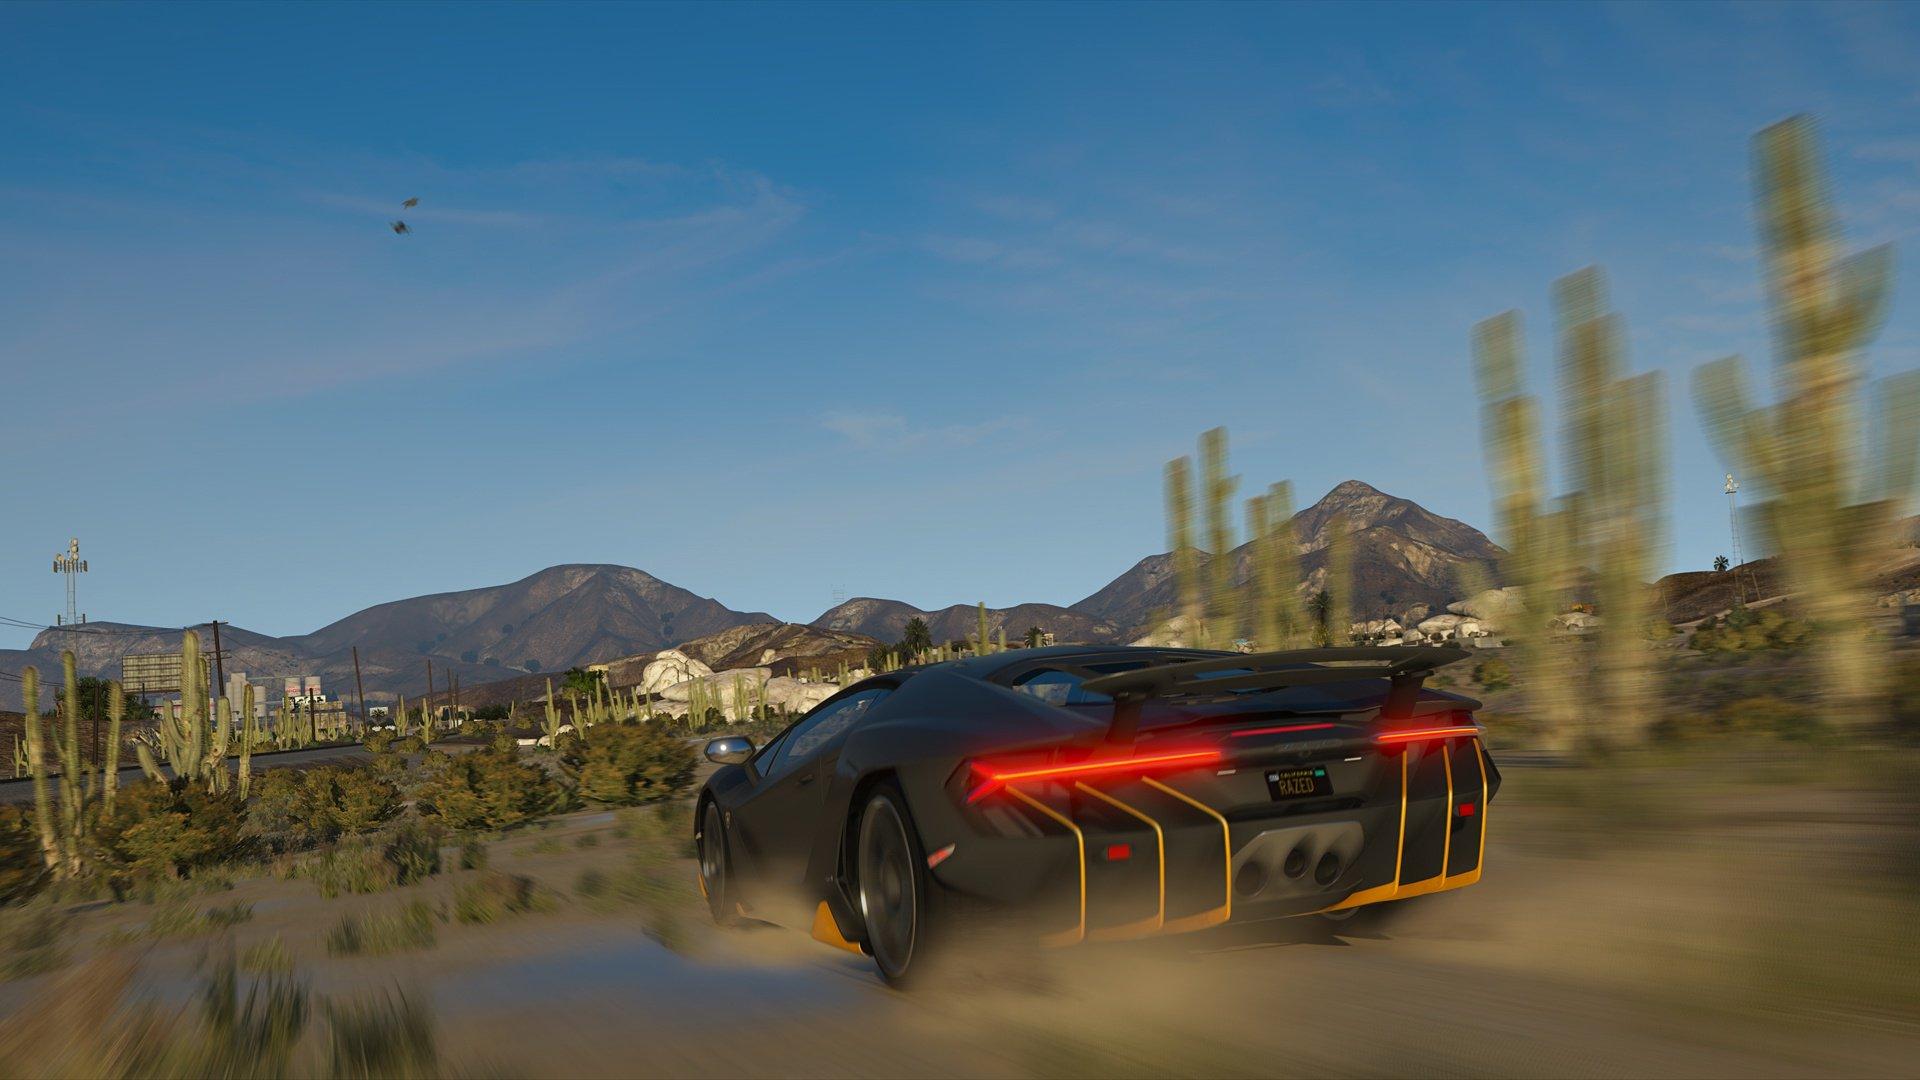 NaturalVision Remastered графический мод для GTA 5 на ПК